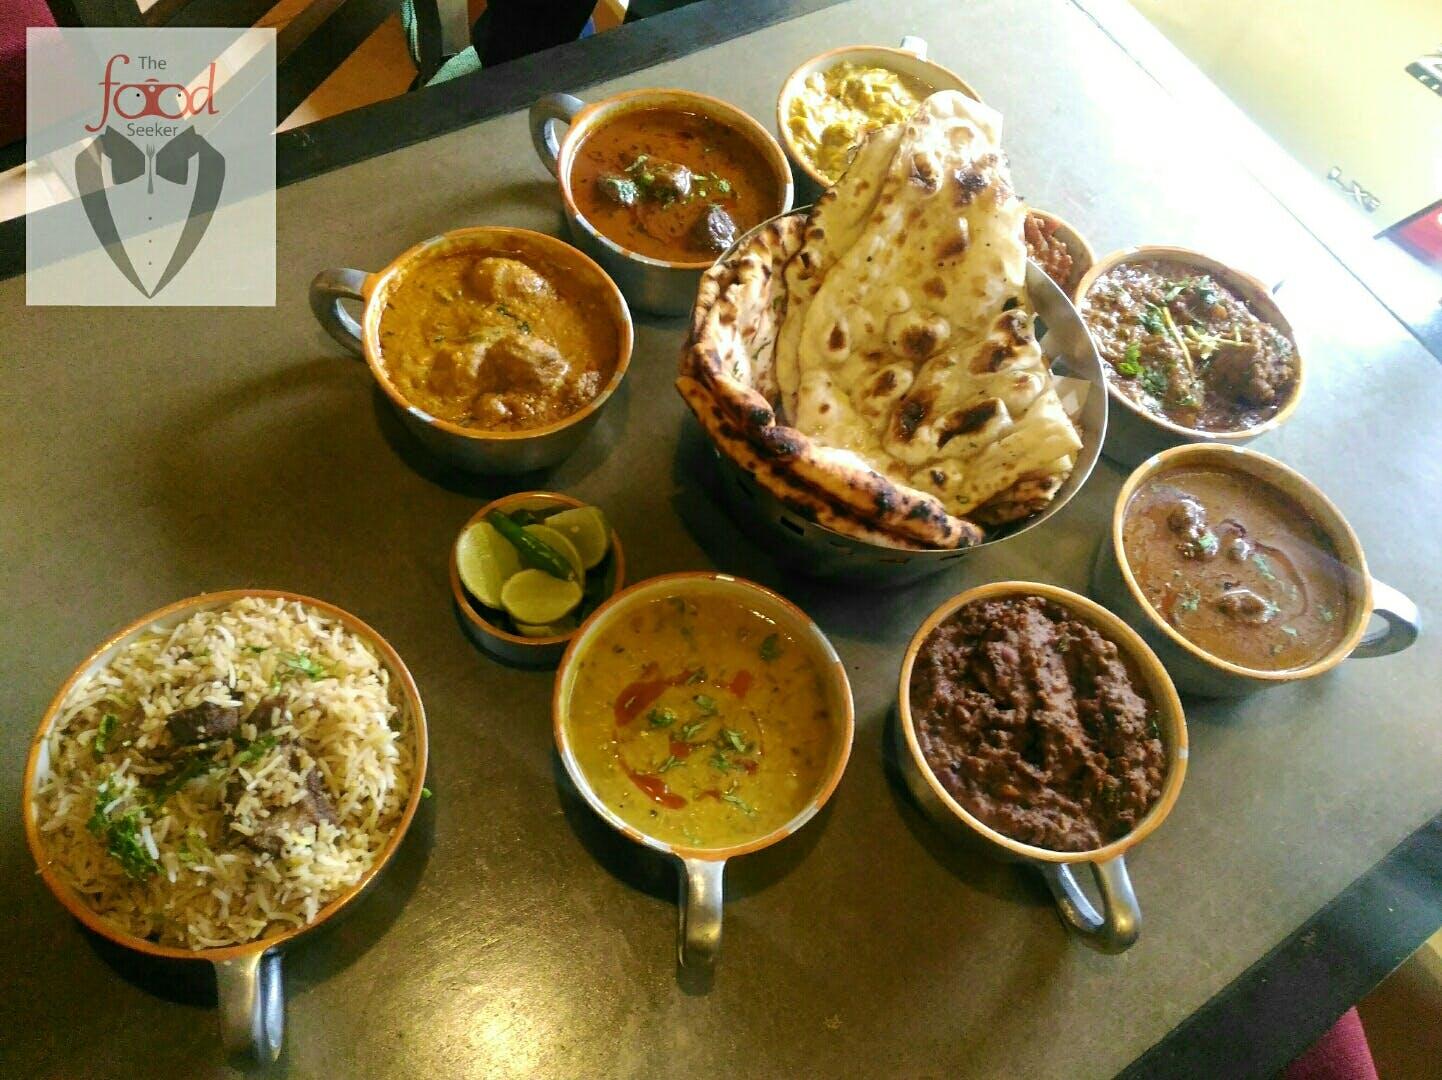 Dish,Food,Cuisine,Ingredient,Curry,Punjabi cuisine,Produce,Meal,Indian cuisine,Sindhi cuisine